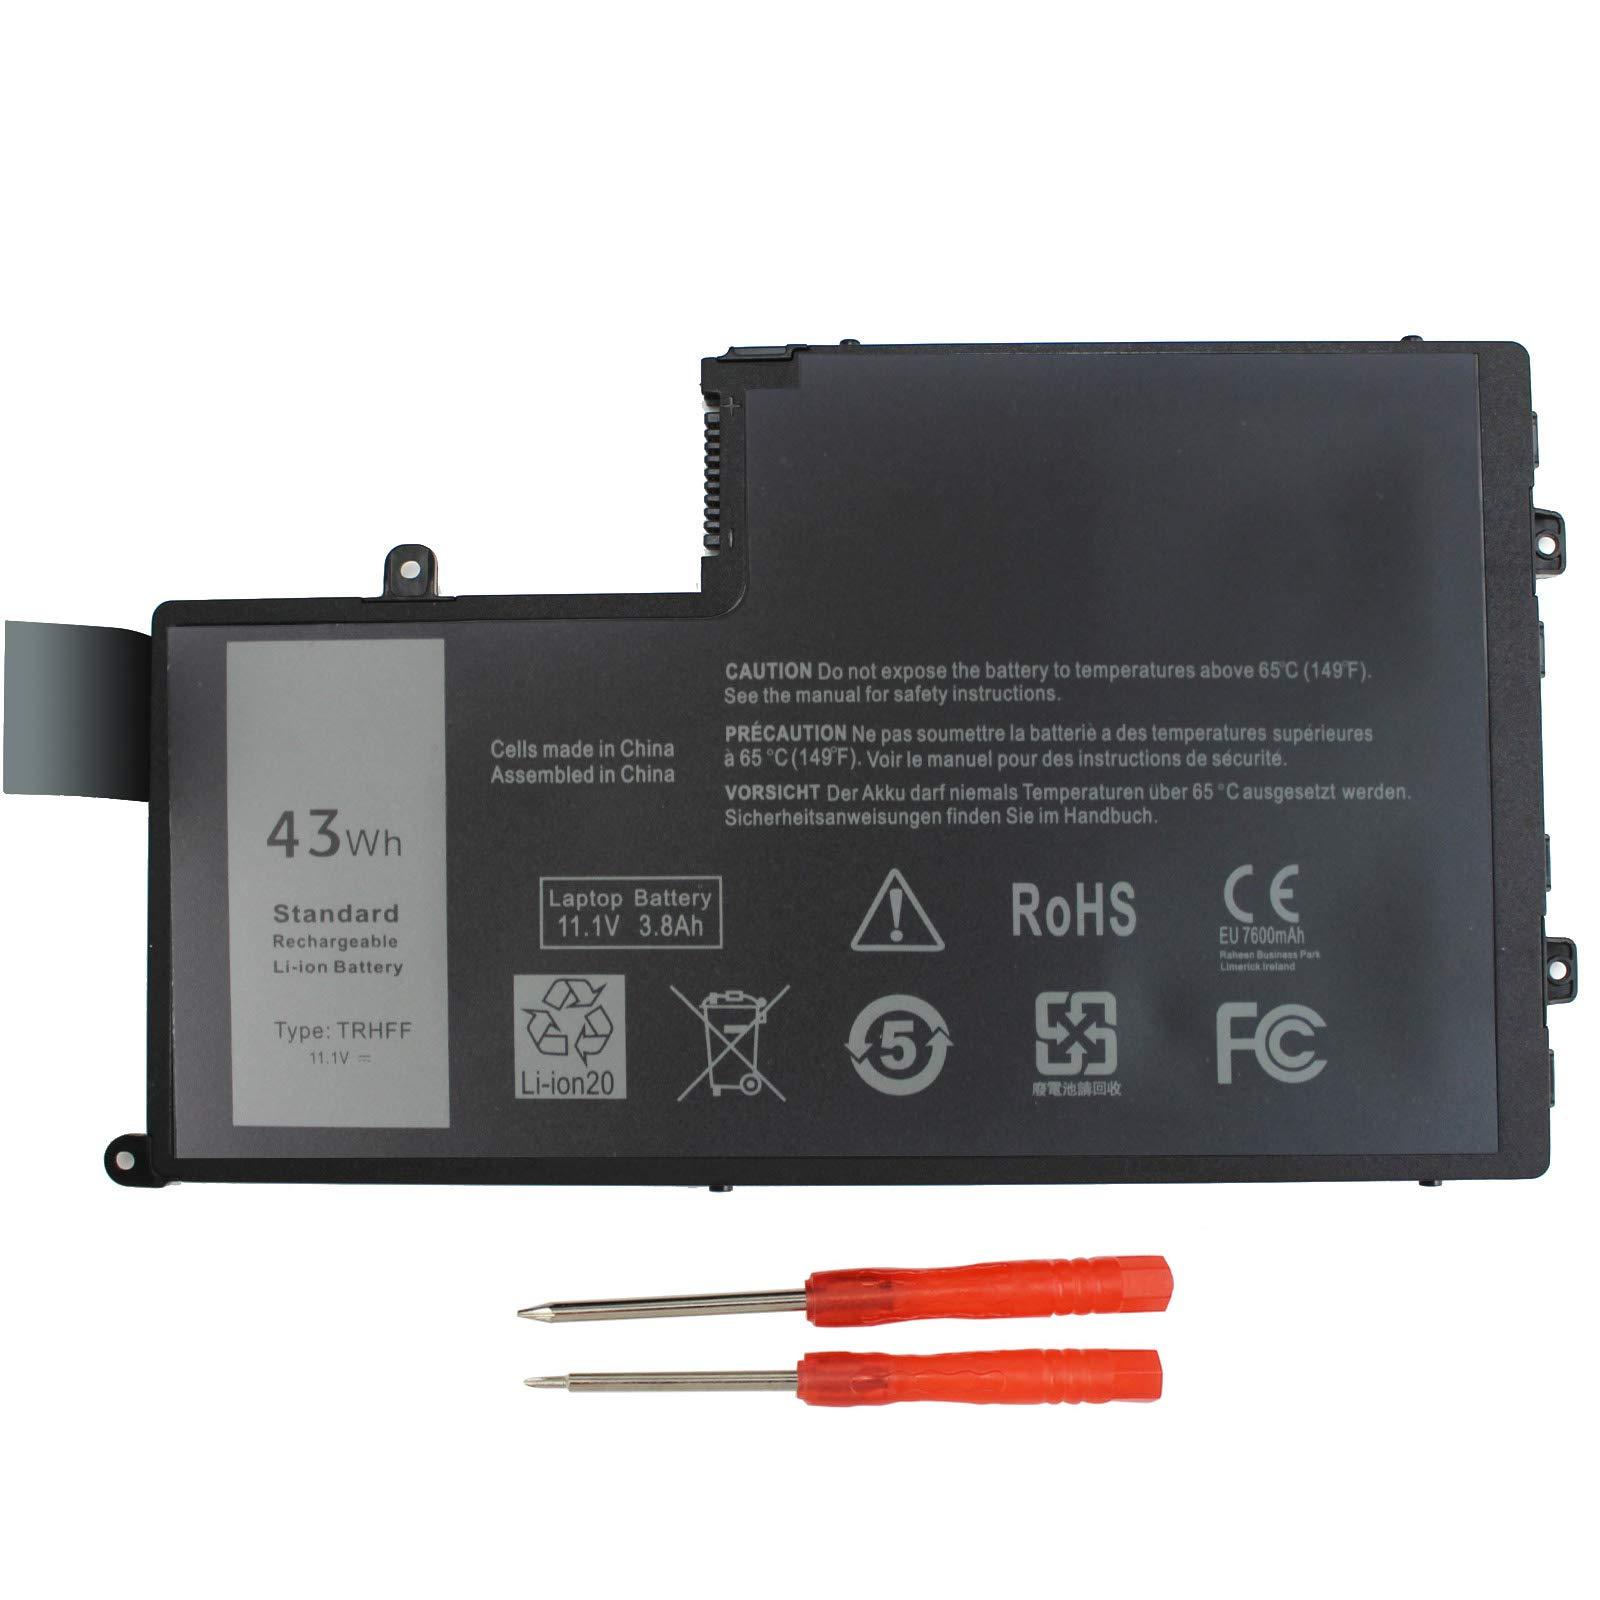 Bateria 11.1v 43wh Trhff Para Dell Inspiron 14-5447 15-5547 Dell Latitude 14 3450 15 3550 1v2f6 Dl011307-prr13g01 01v2f6